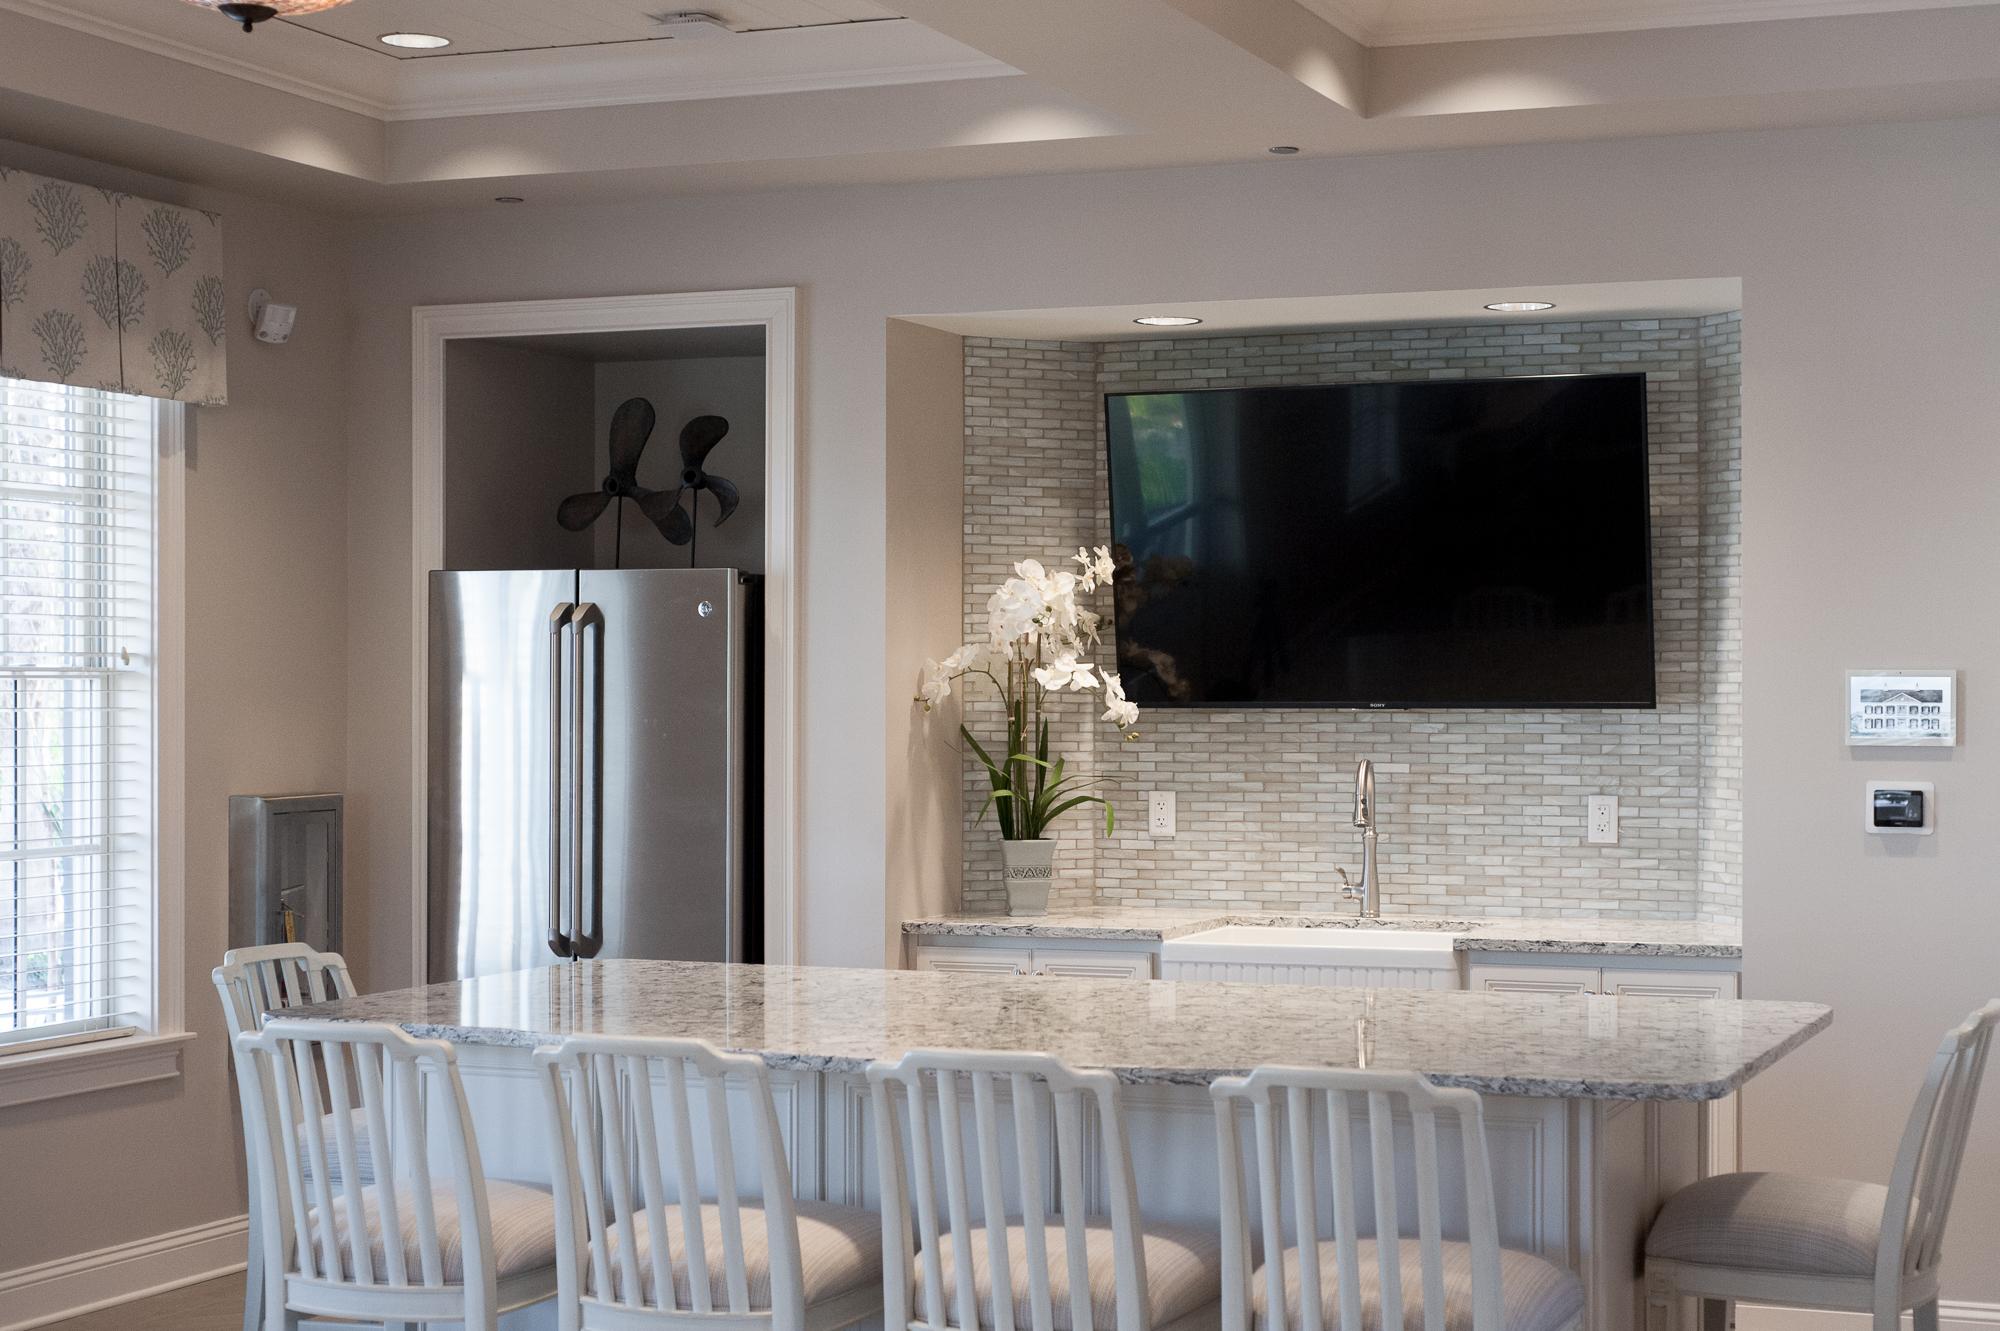 Micamy_Design_Studio_Interior_Design_Markland_StAugustine_Clubhouse_OldFlorida_Coastal_Glass_Mosaic_Tile_Backsplash_Kitchen_Cambria_Kohler_Blue_ (3).jpg